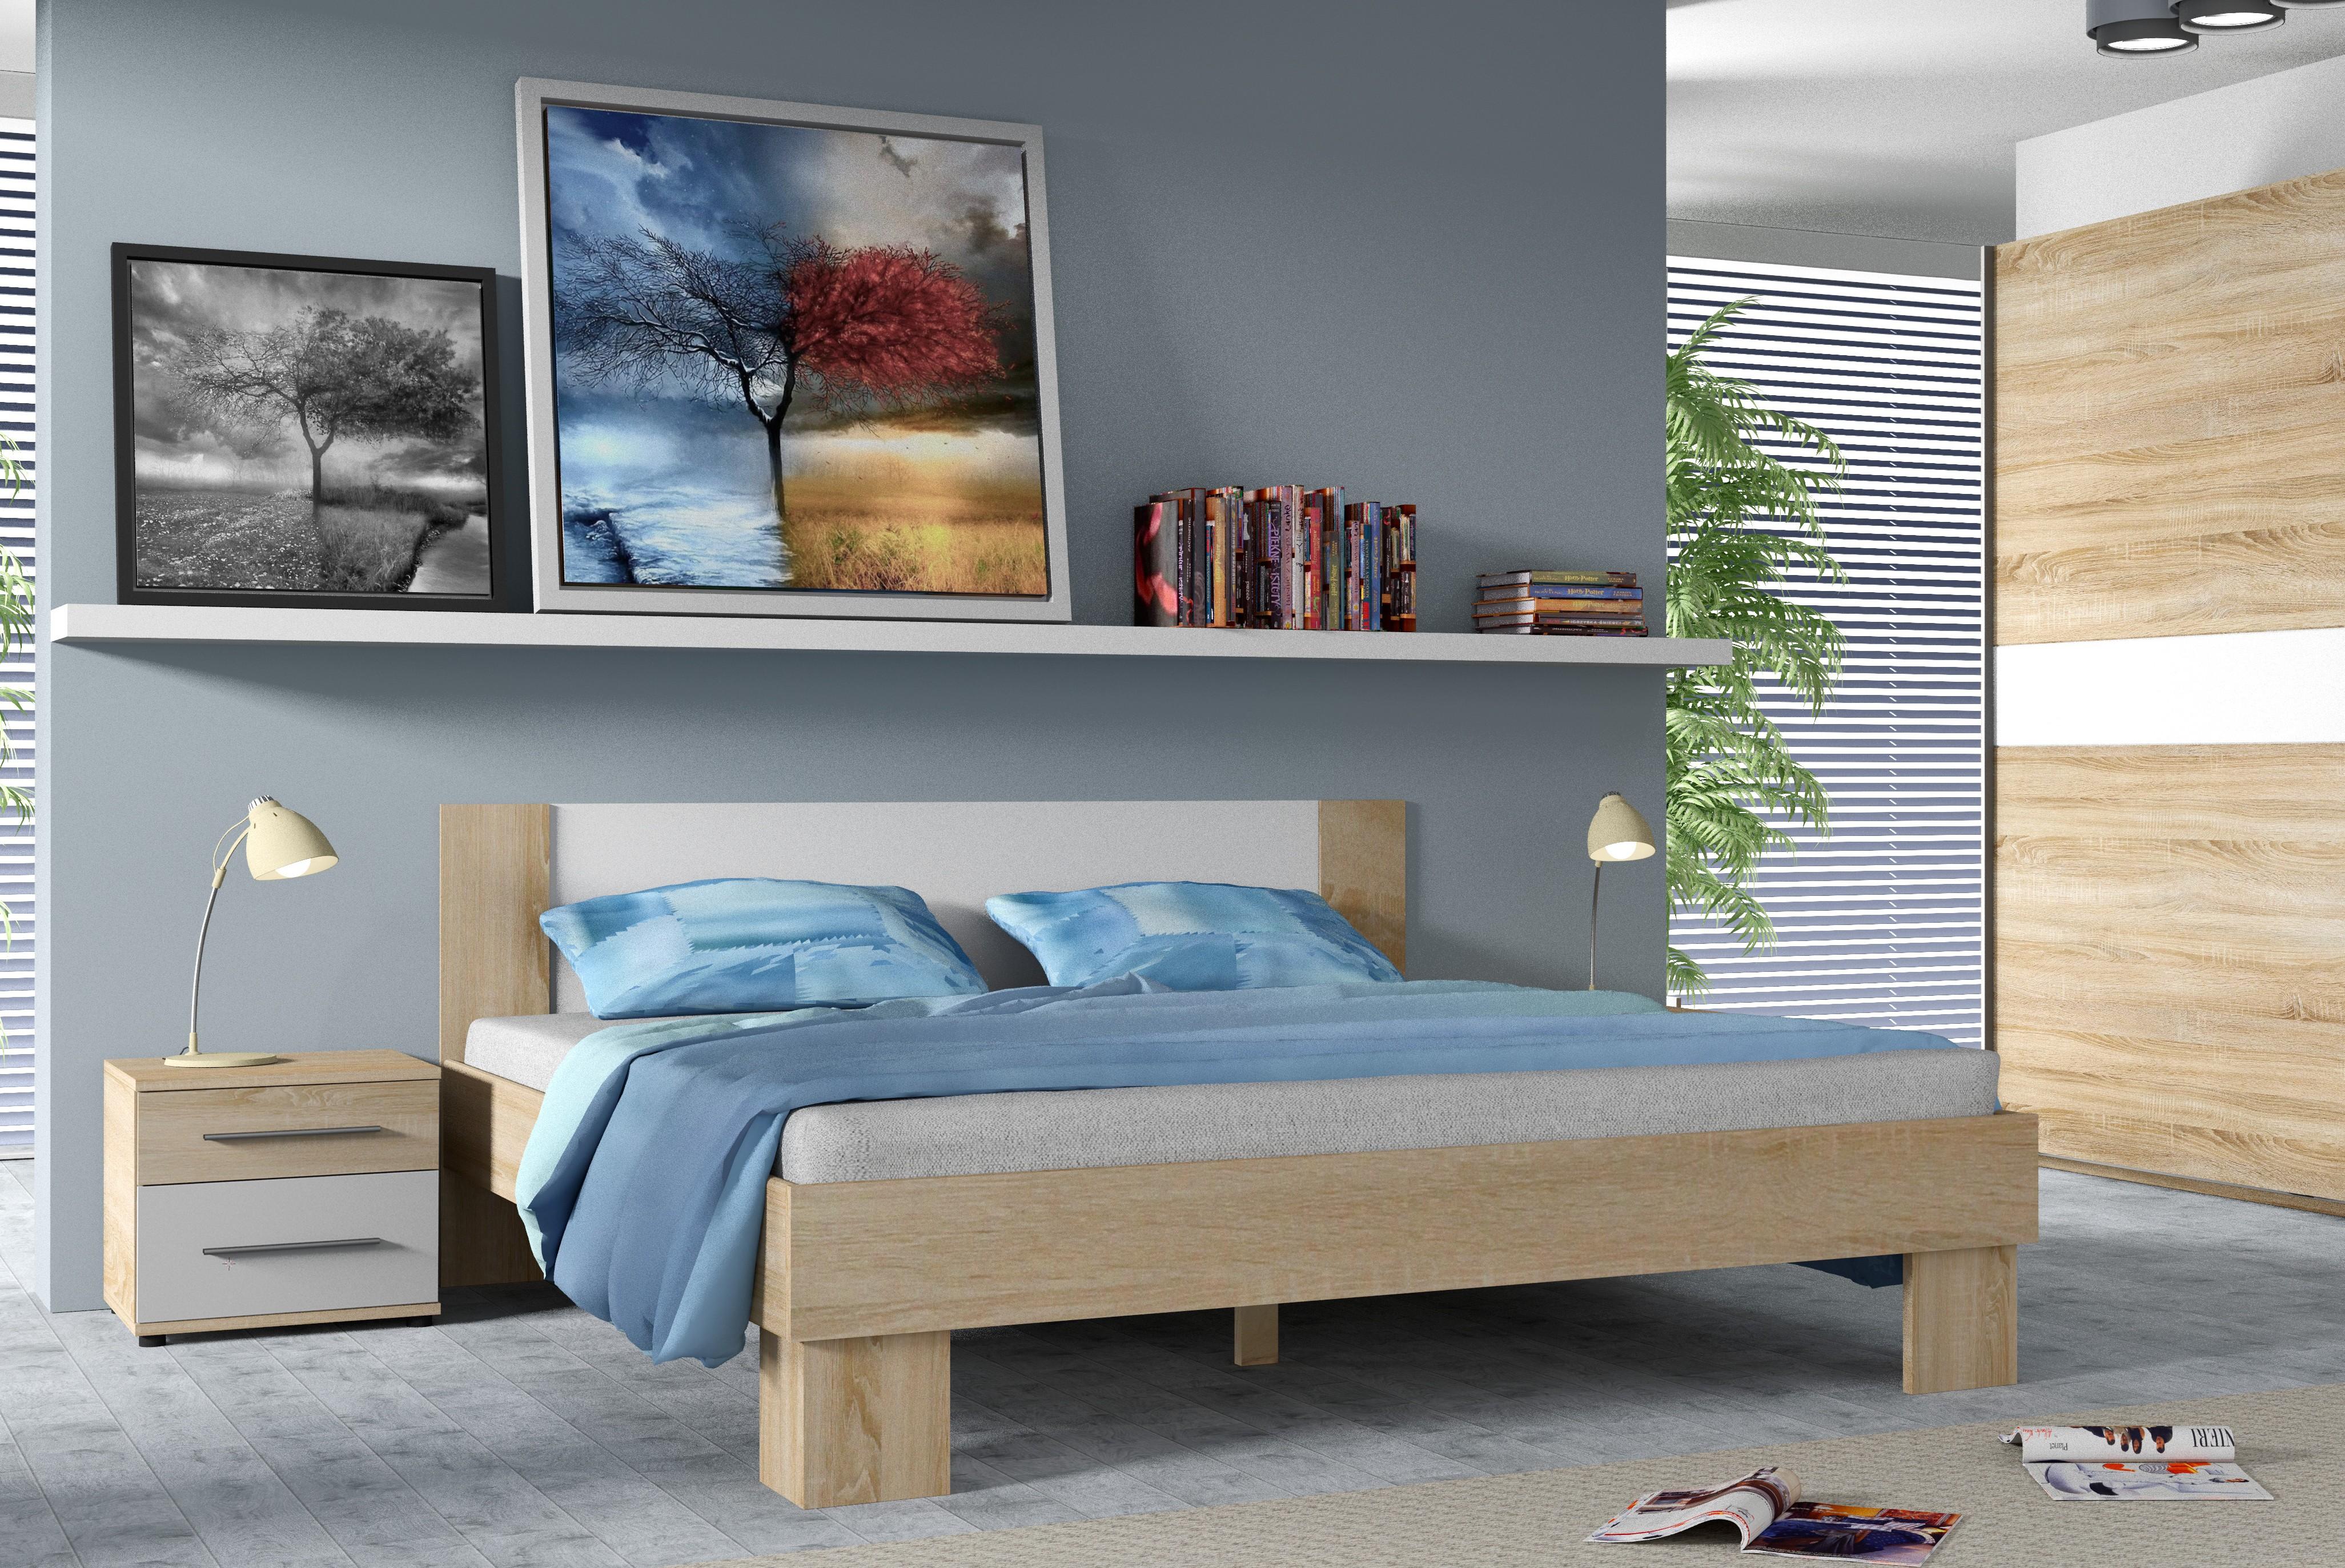 Manželská postel COCOA, 160x200, dub Sonoma/bílá